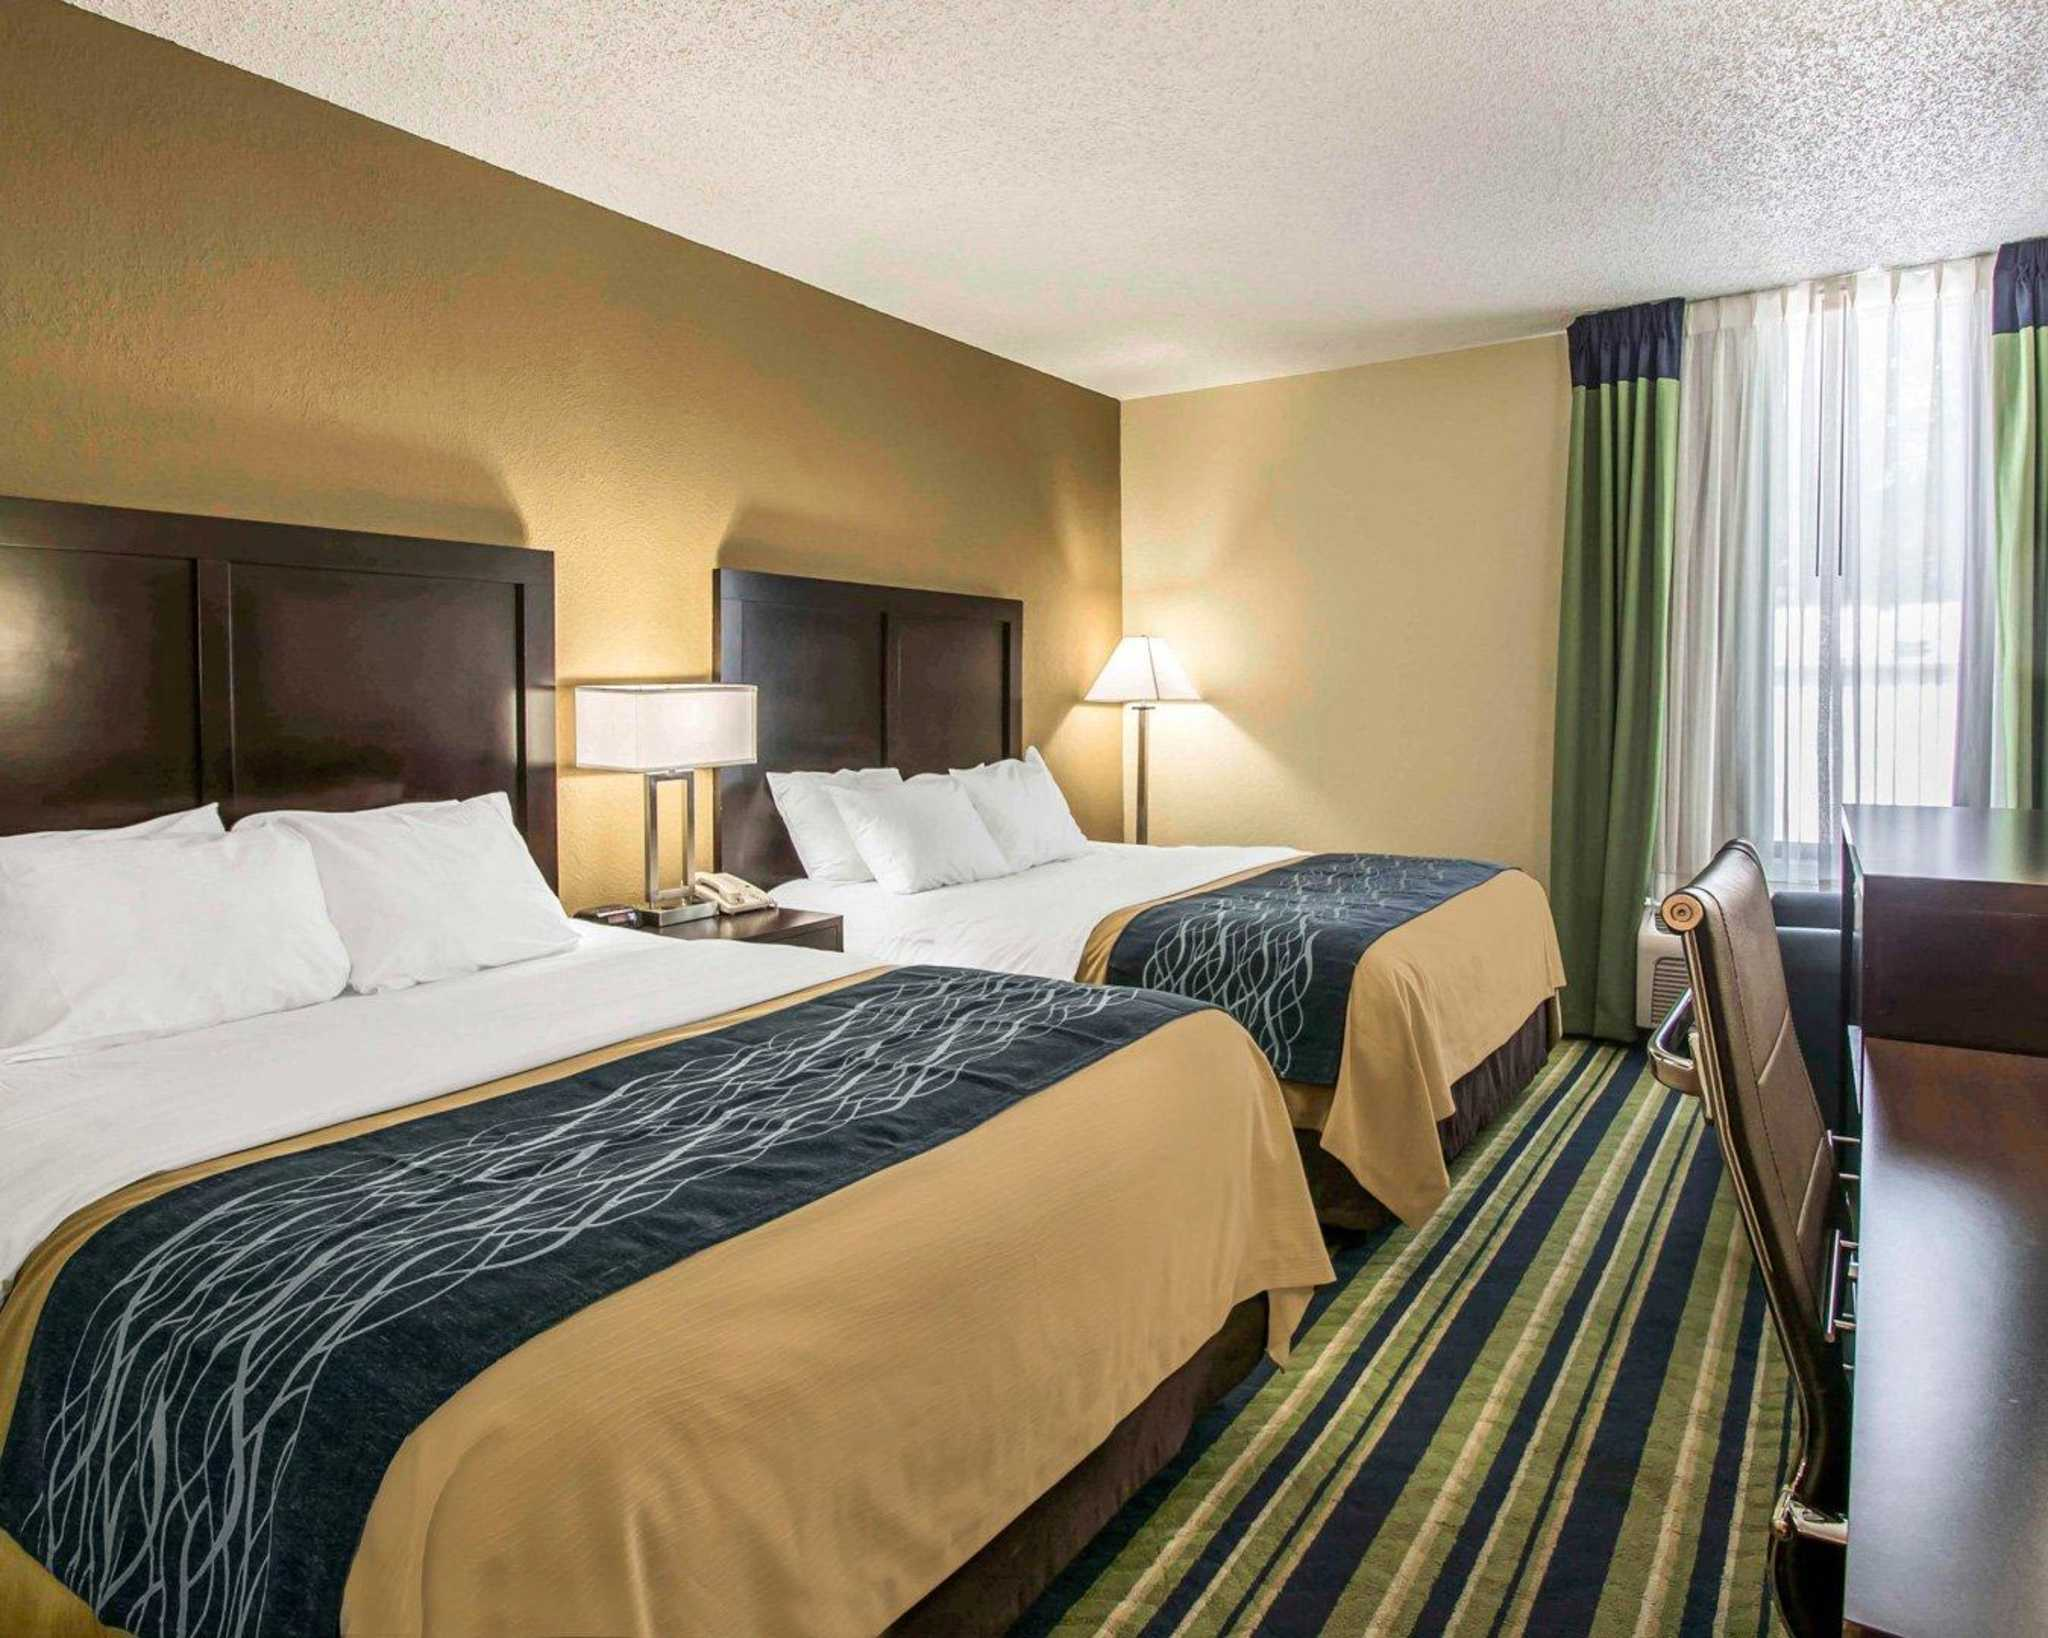 Comfort Inn & Suites Lantana - West Palm Beach South image 27